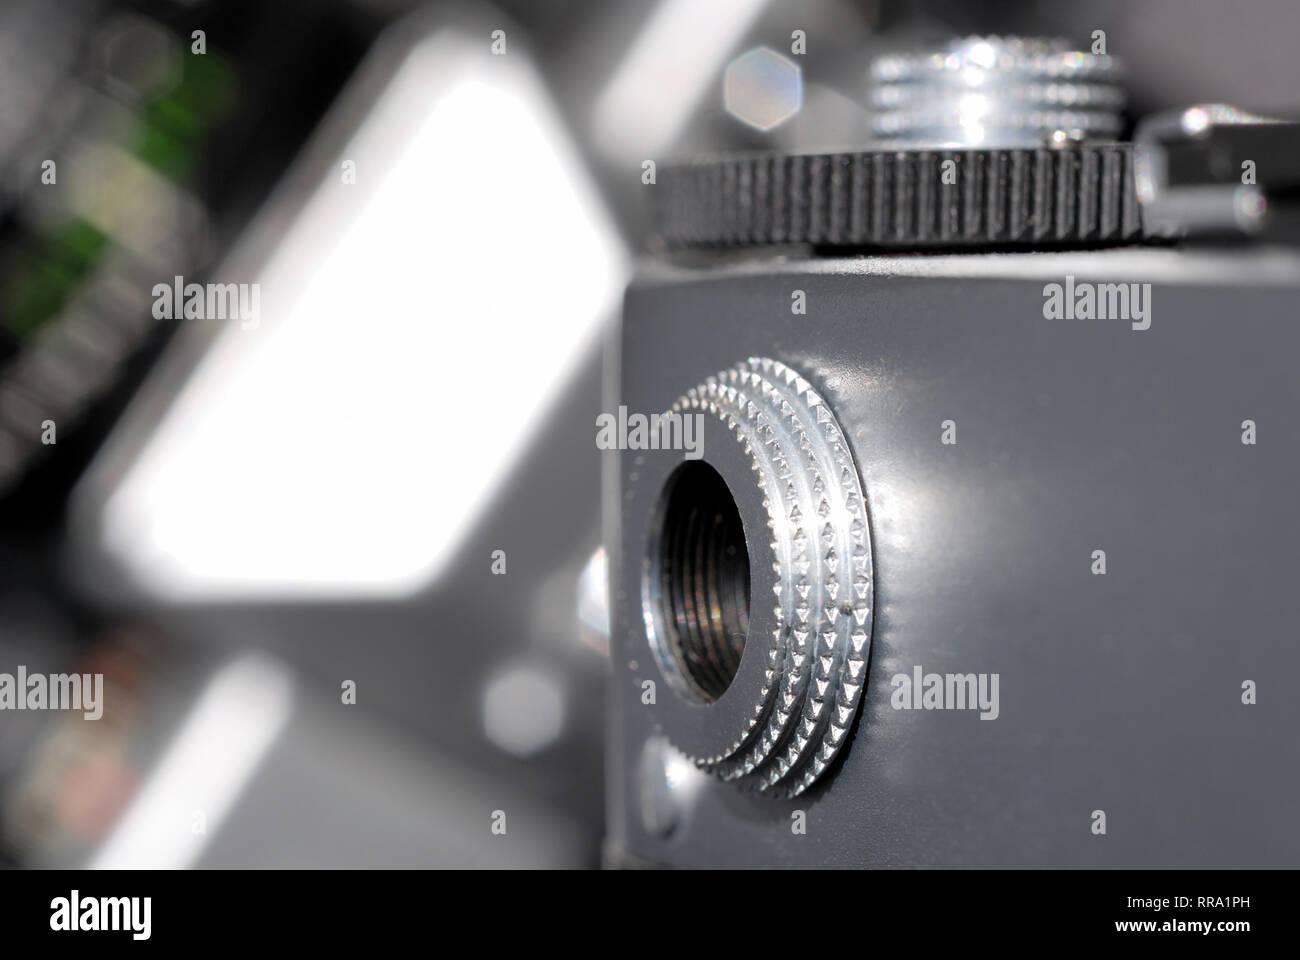 Retro film camera viewer. Shallow depth of field - Stock Image